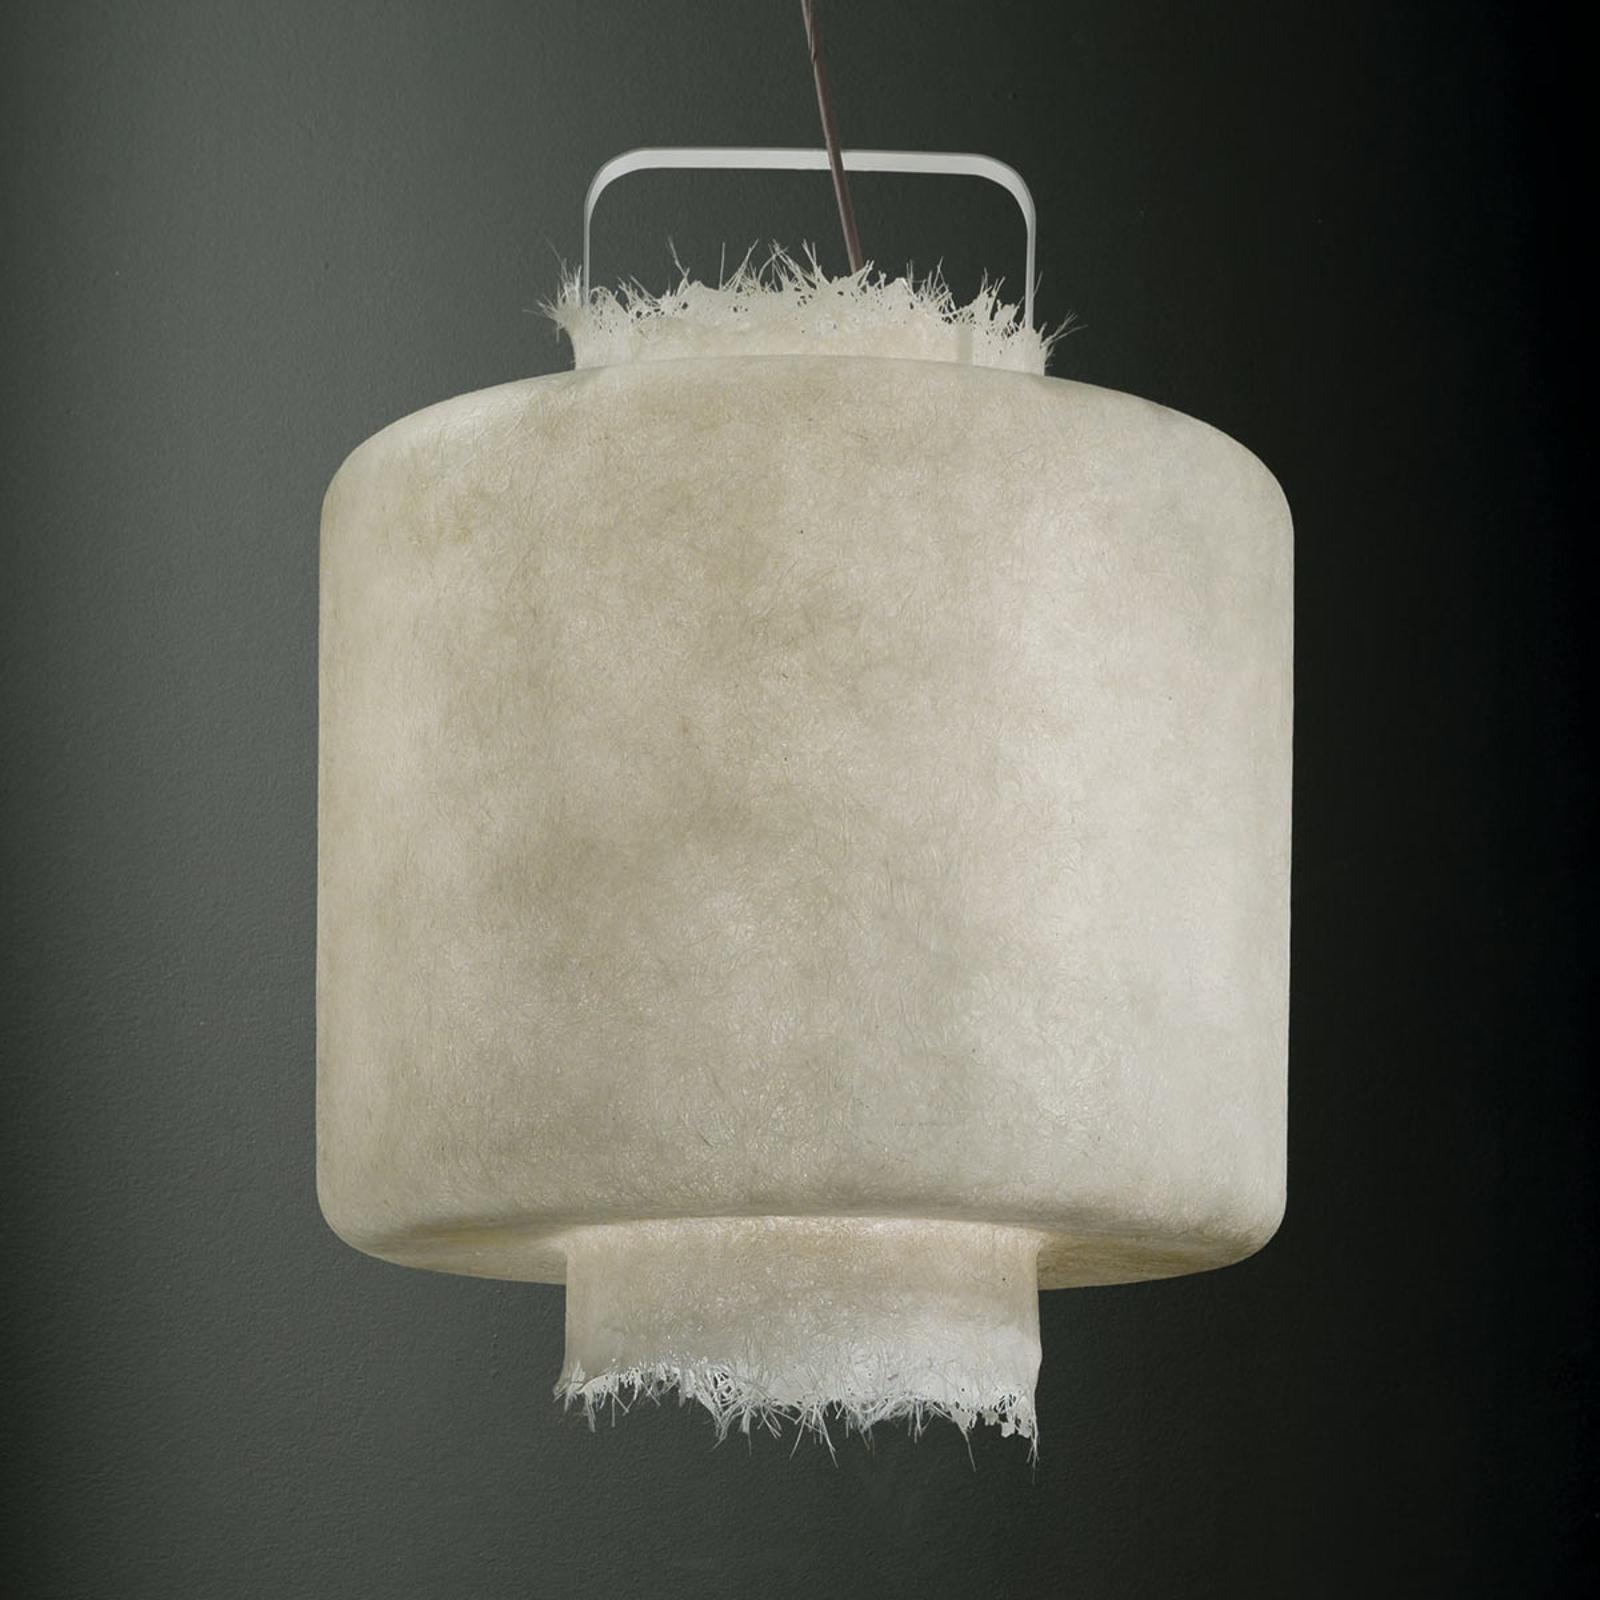 Karman Kimono - vit LED-hänglampa 50 cm